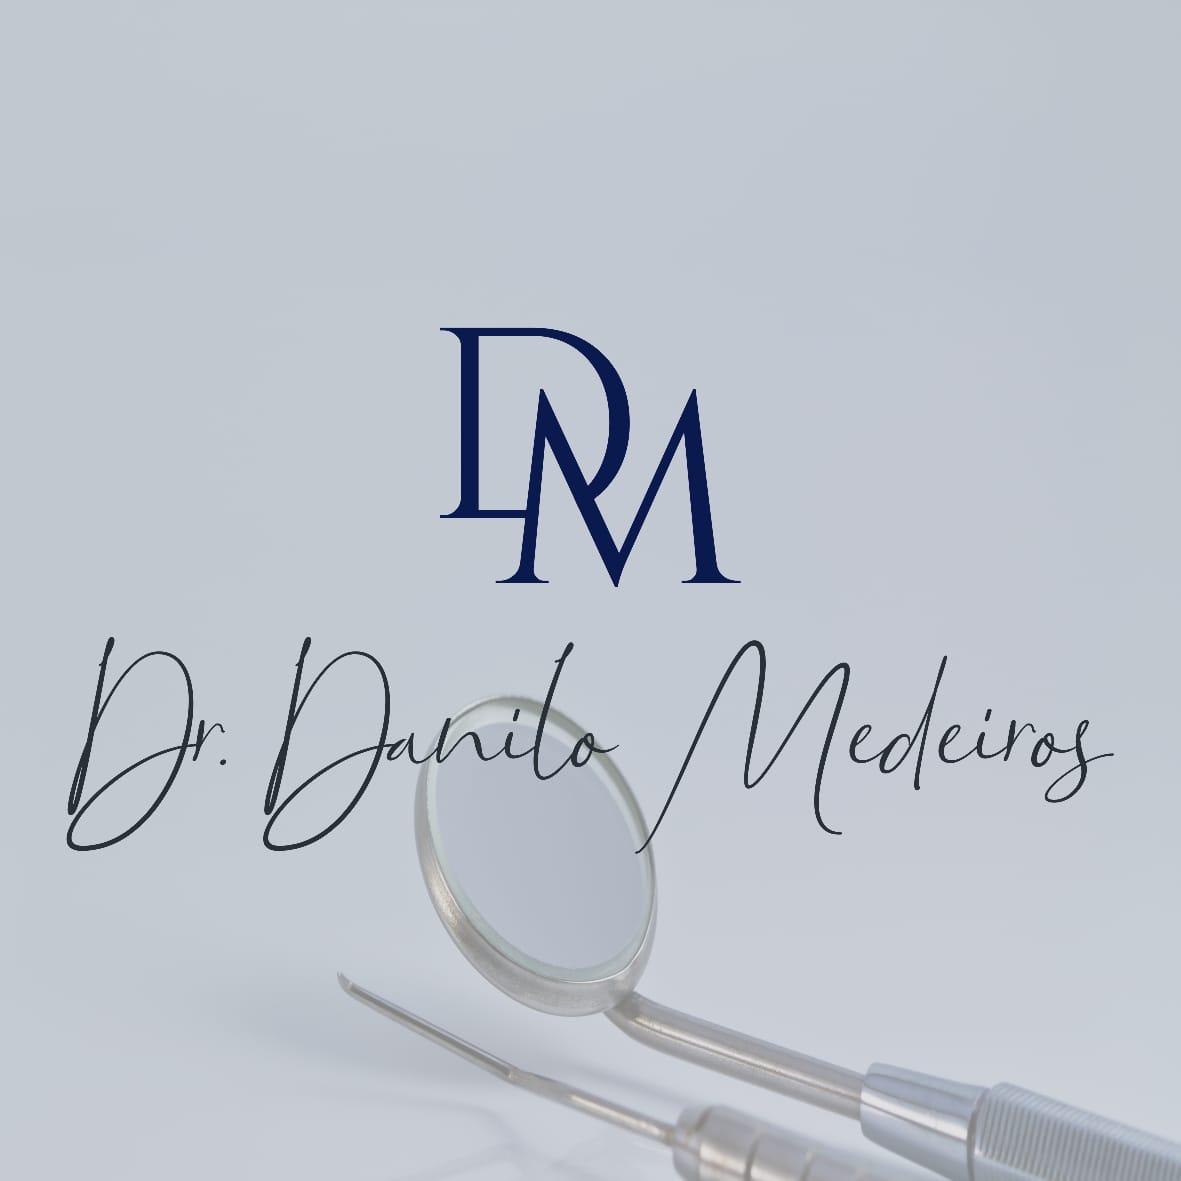 Dr Danilo Medeiros